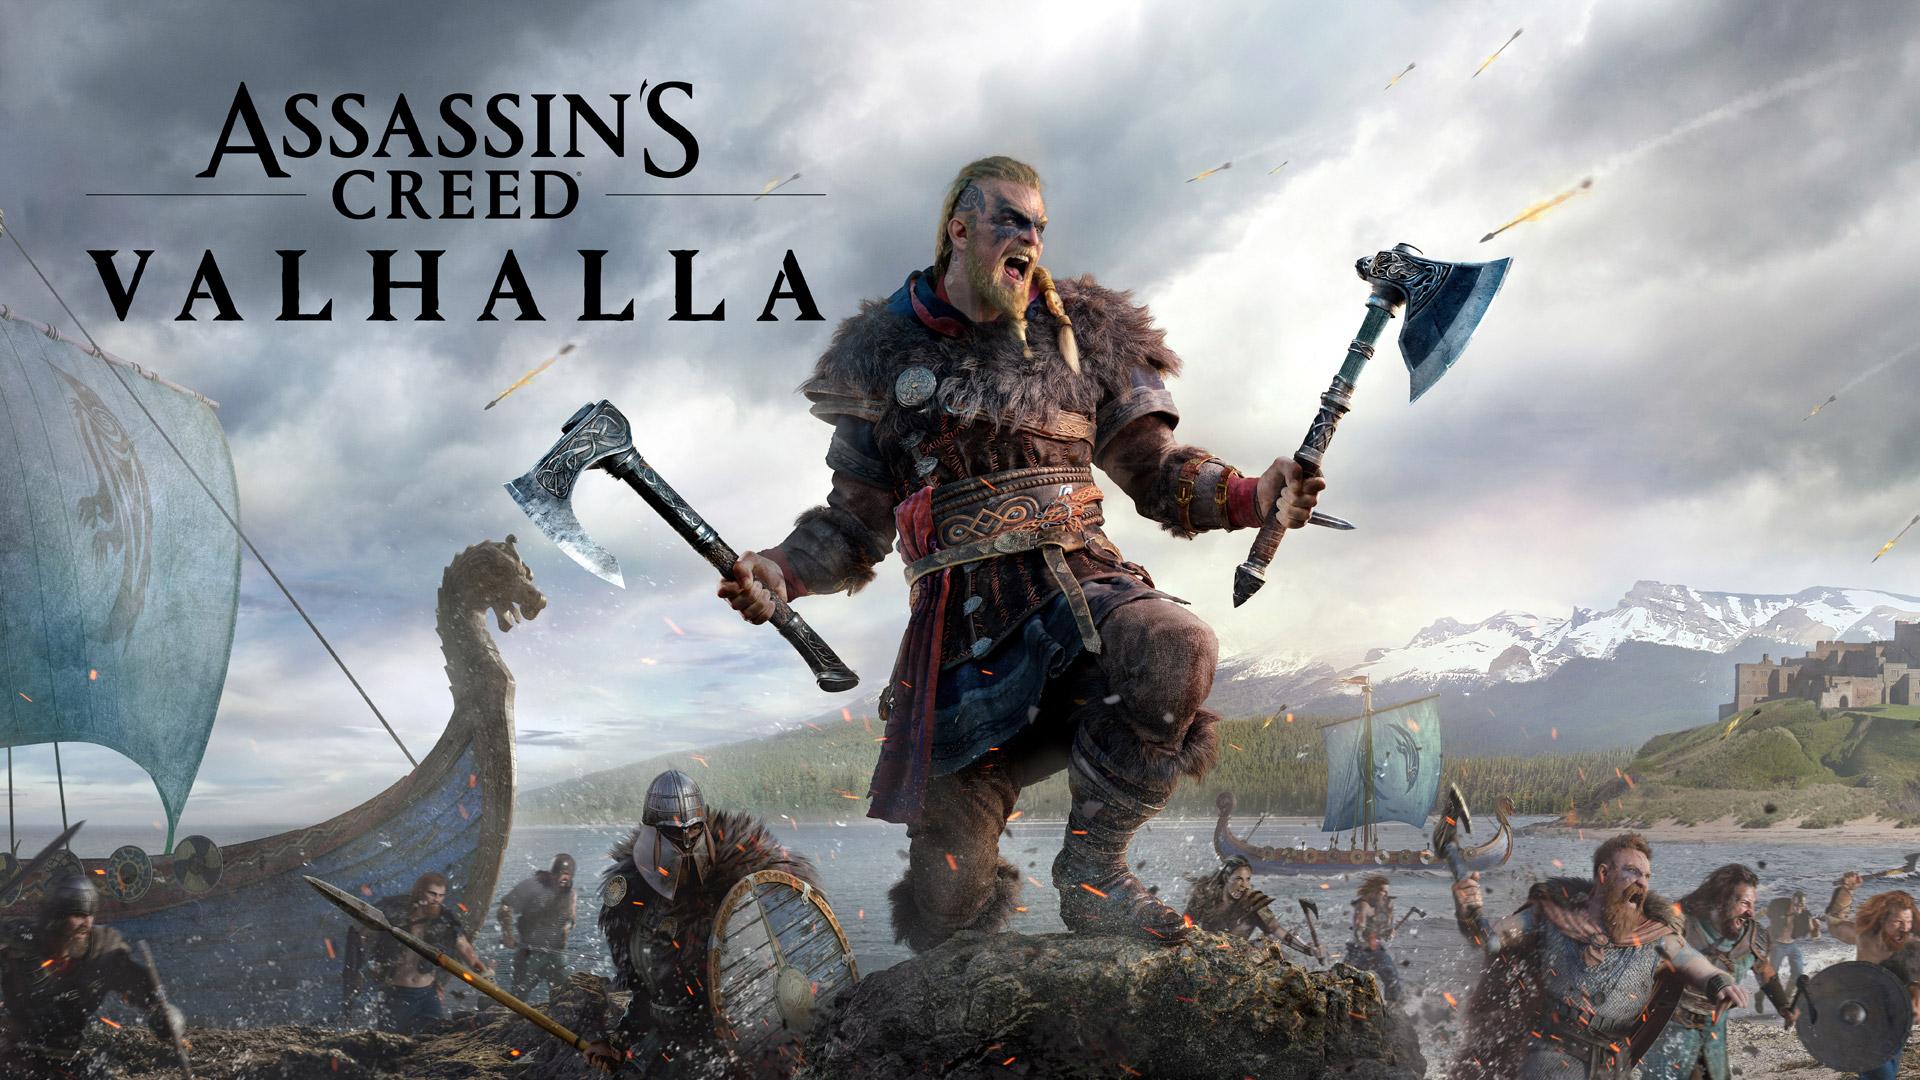 Assassin's Creed Valhalla Wallpaper in 1920x1080